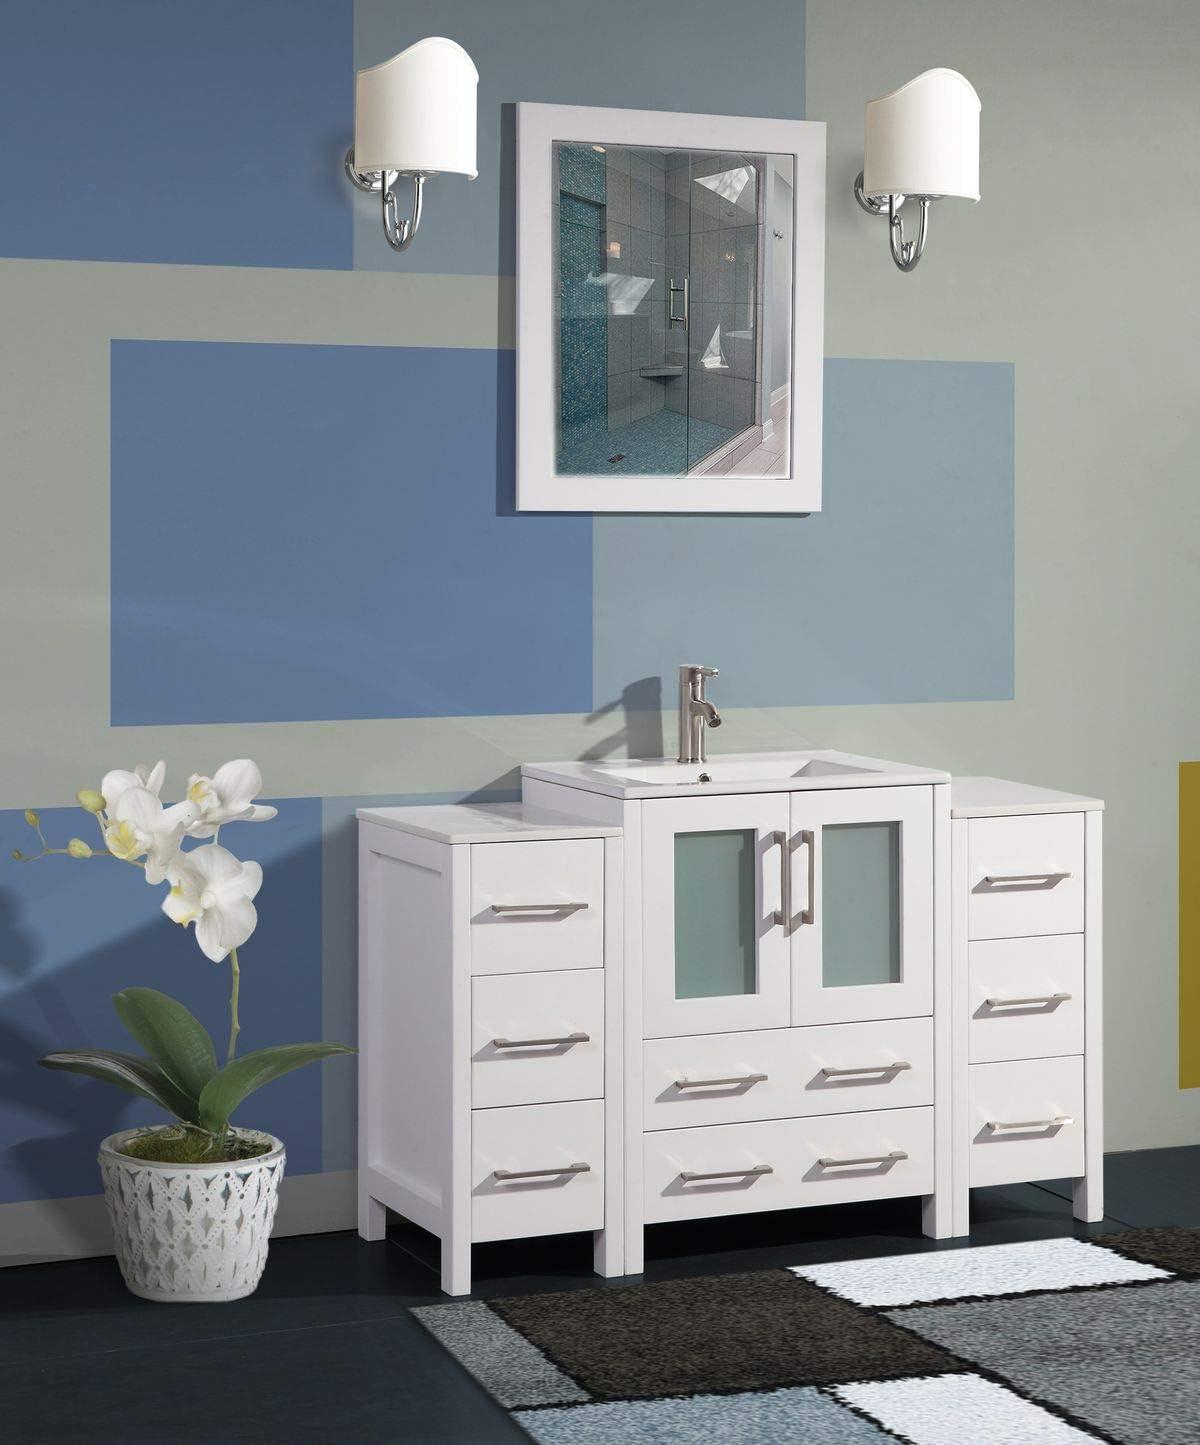 Amazon Com Vanity Art 48 Inch Single Sink Modern Bathroom Vanity Combo Set 2 Side Cabinets 1 Shelf 8 Drawers Ceramic Top Bathroom Cabinet With Free Mirror Va3024 48 W Kitchen Dining